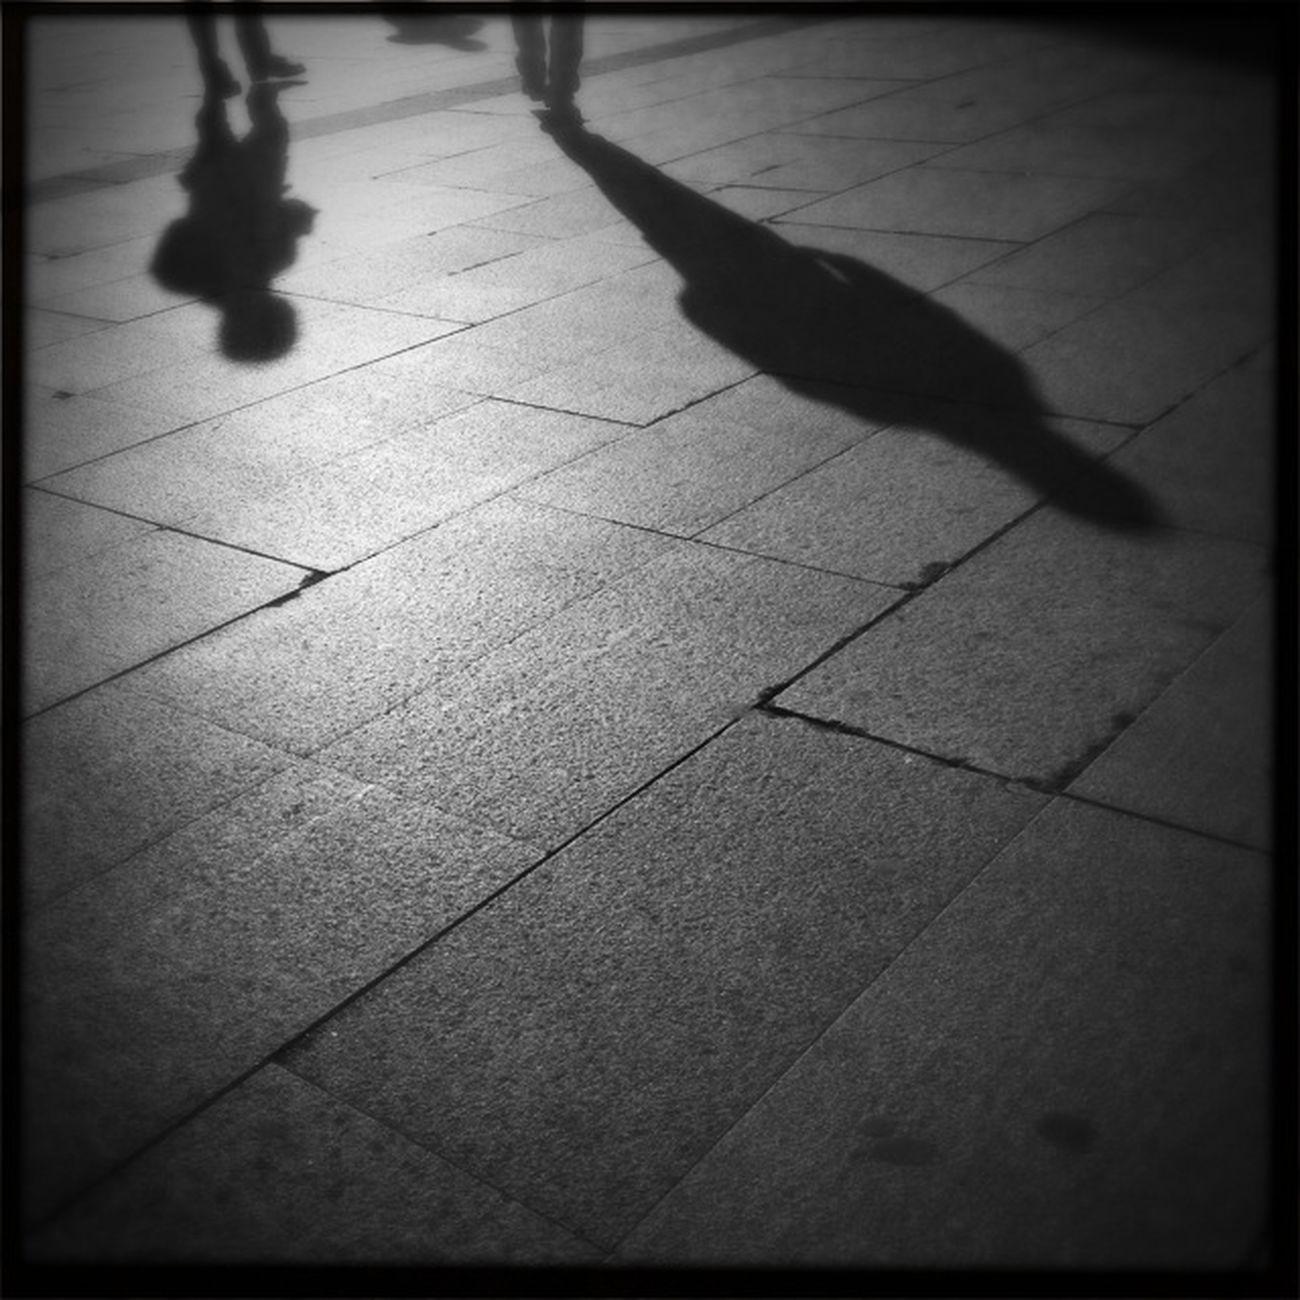 Streetphotography Hipstamatic Blackandwhite Shadows